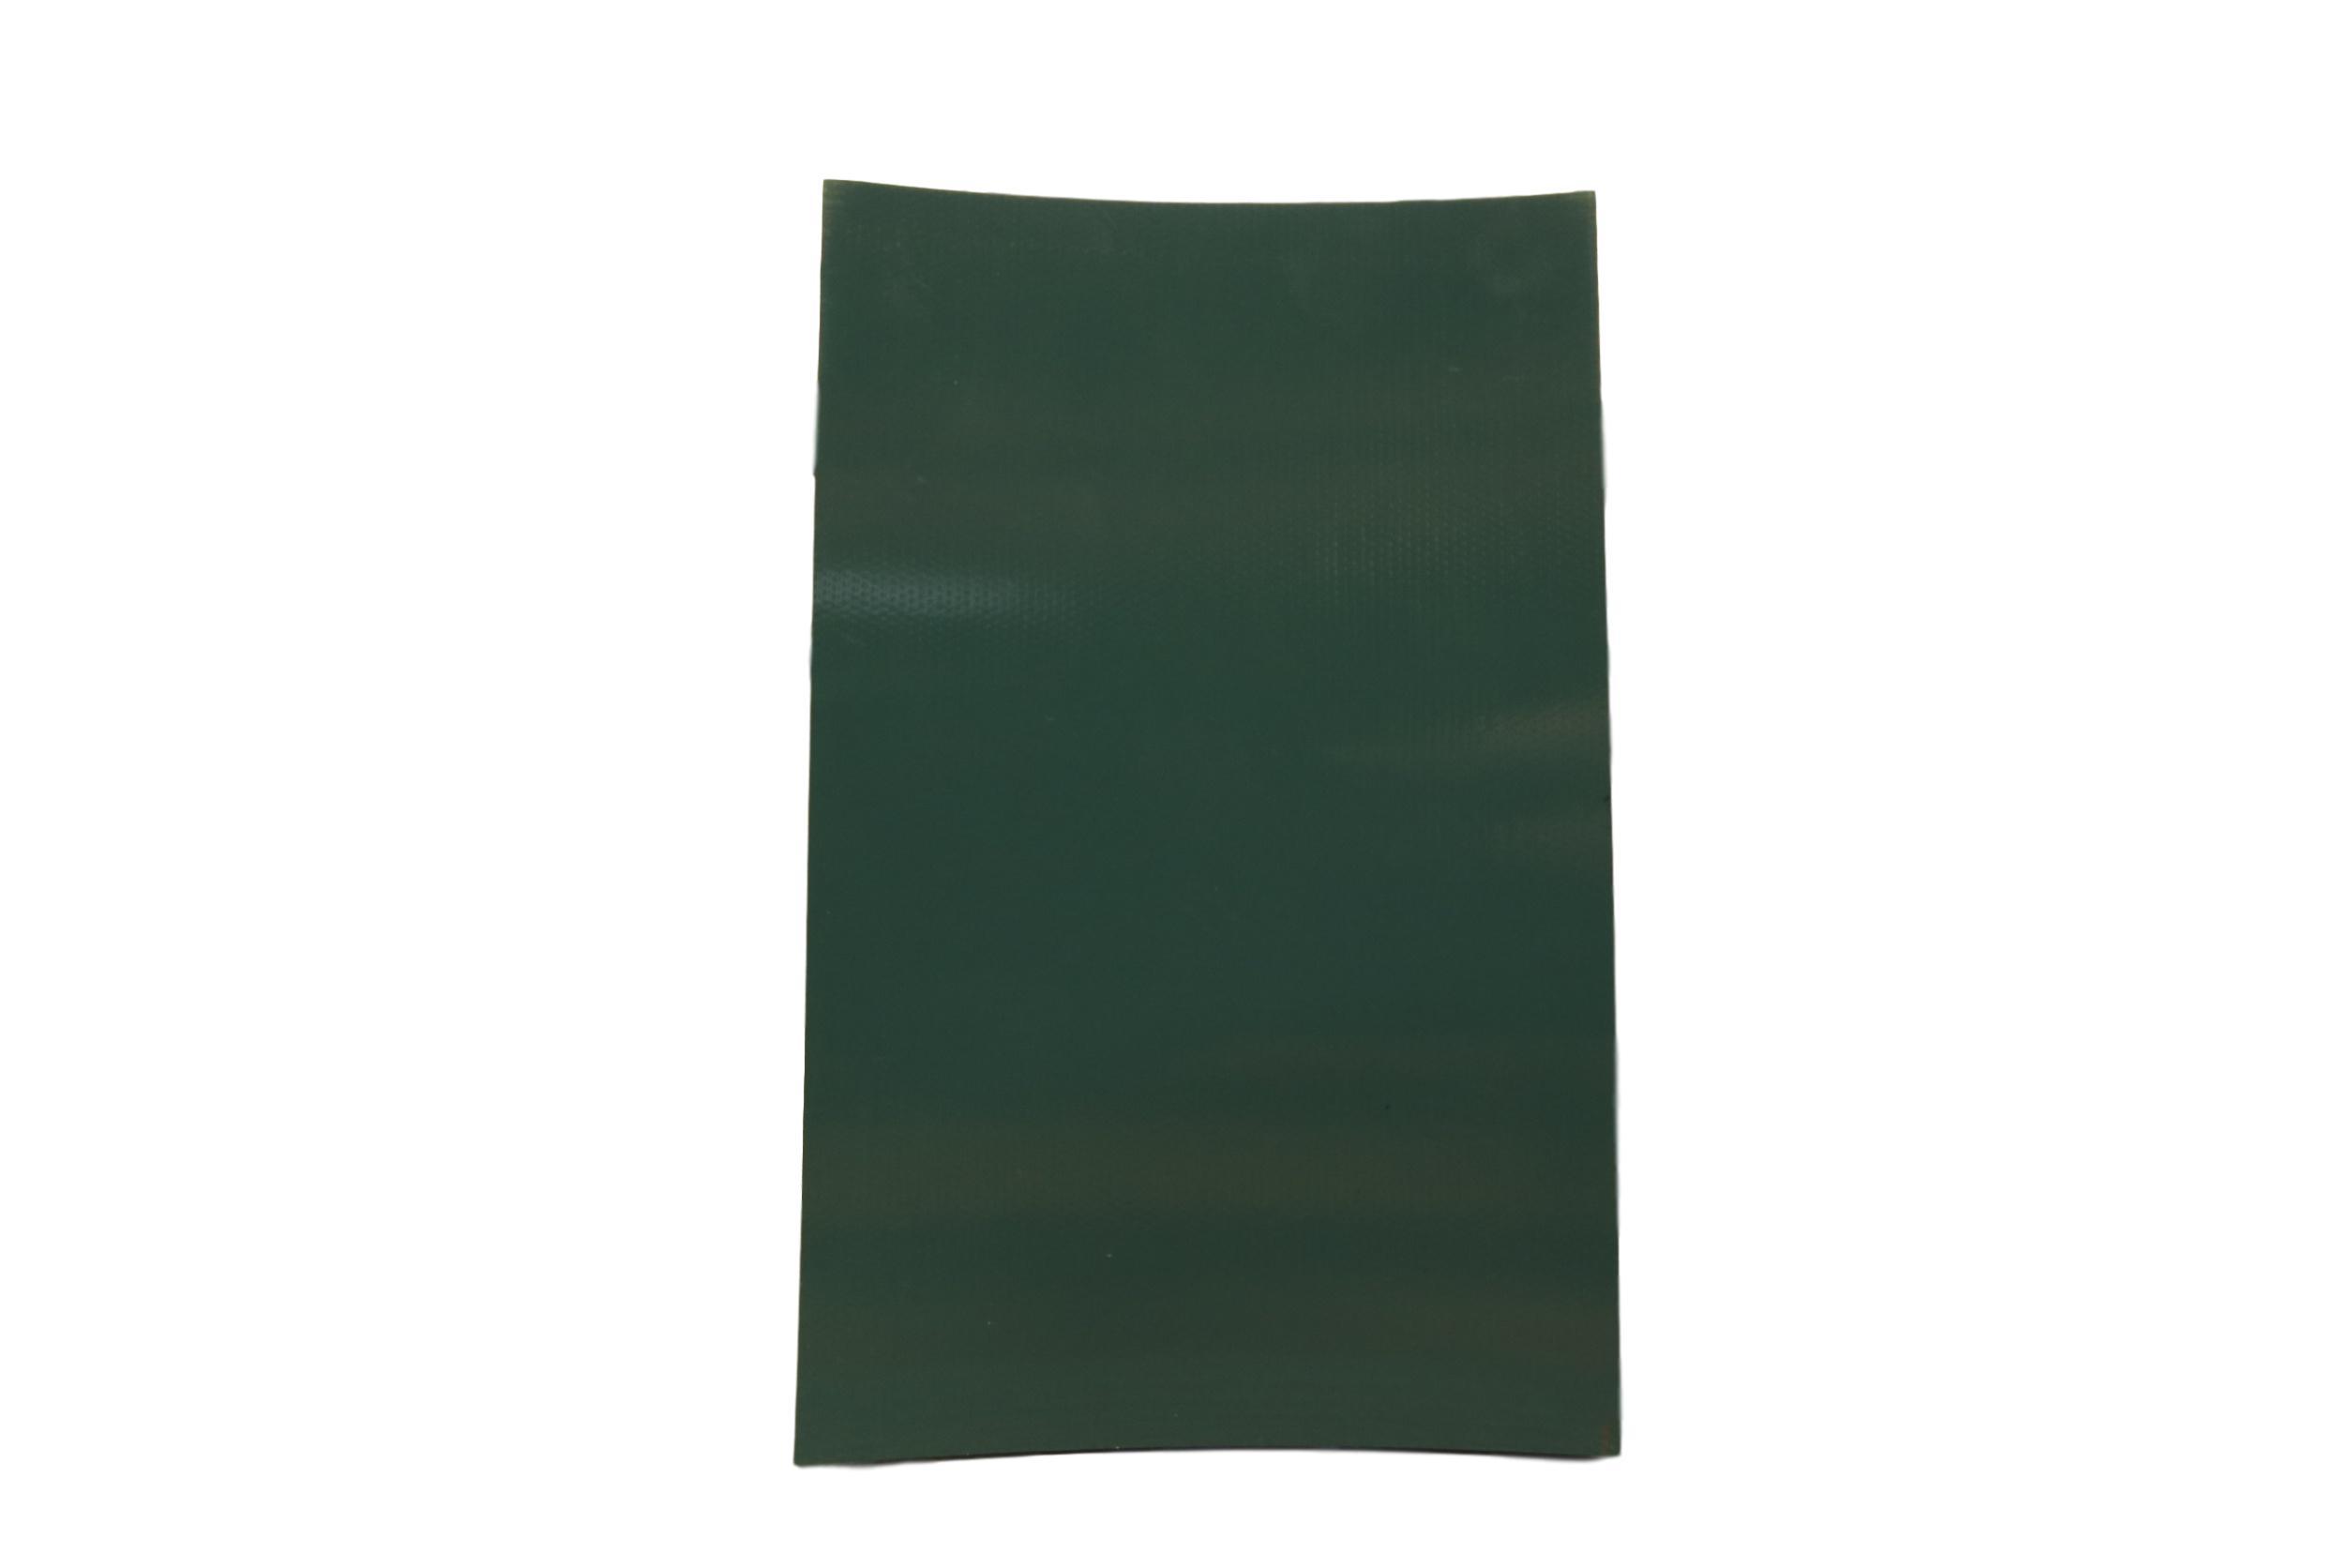 Conveyor Belting Petrol Green 3 PLY PVC Ridgid 3.6mm